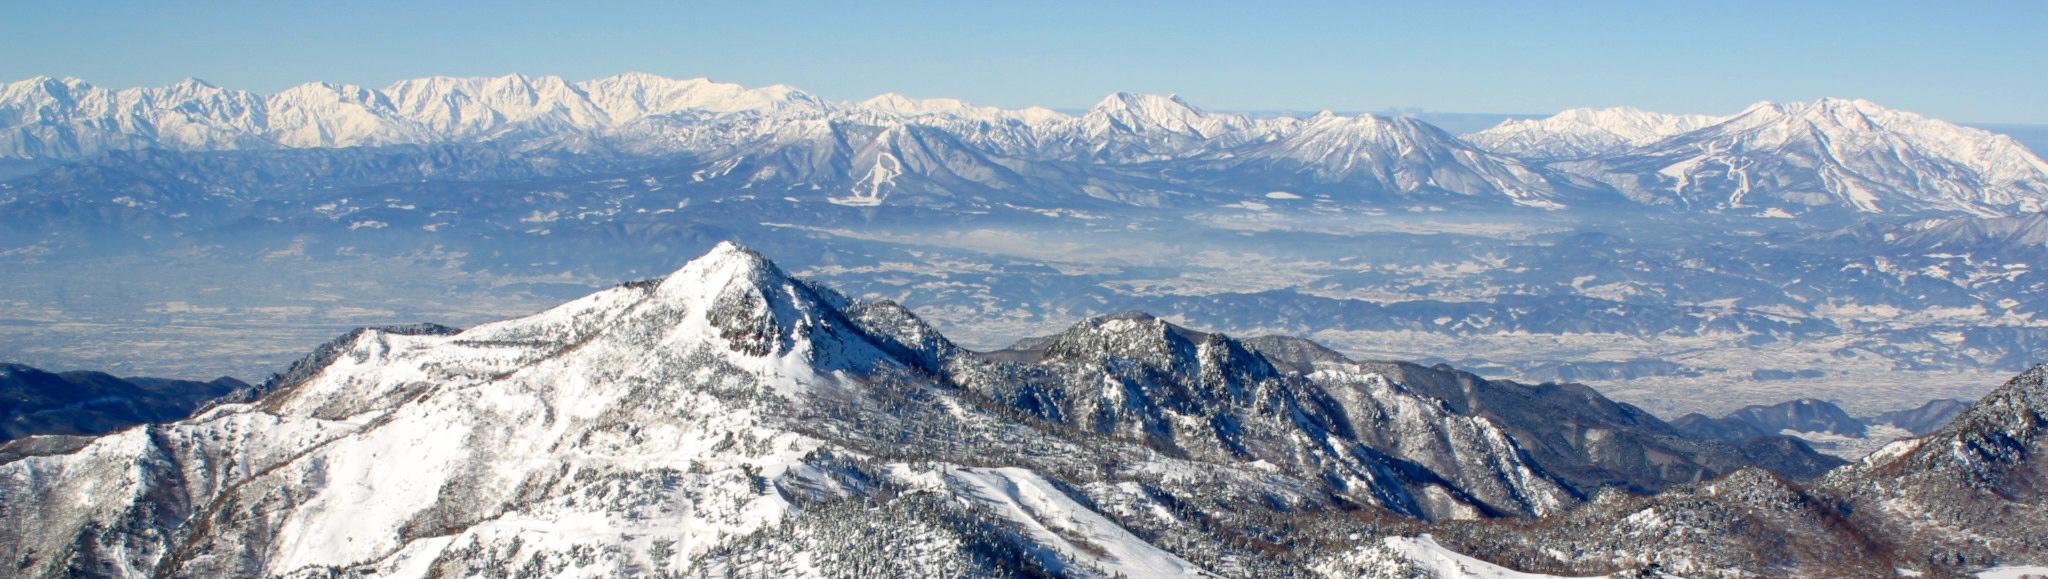 Travel Nagano